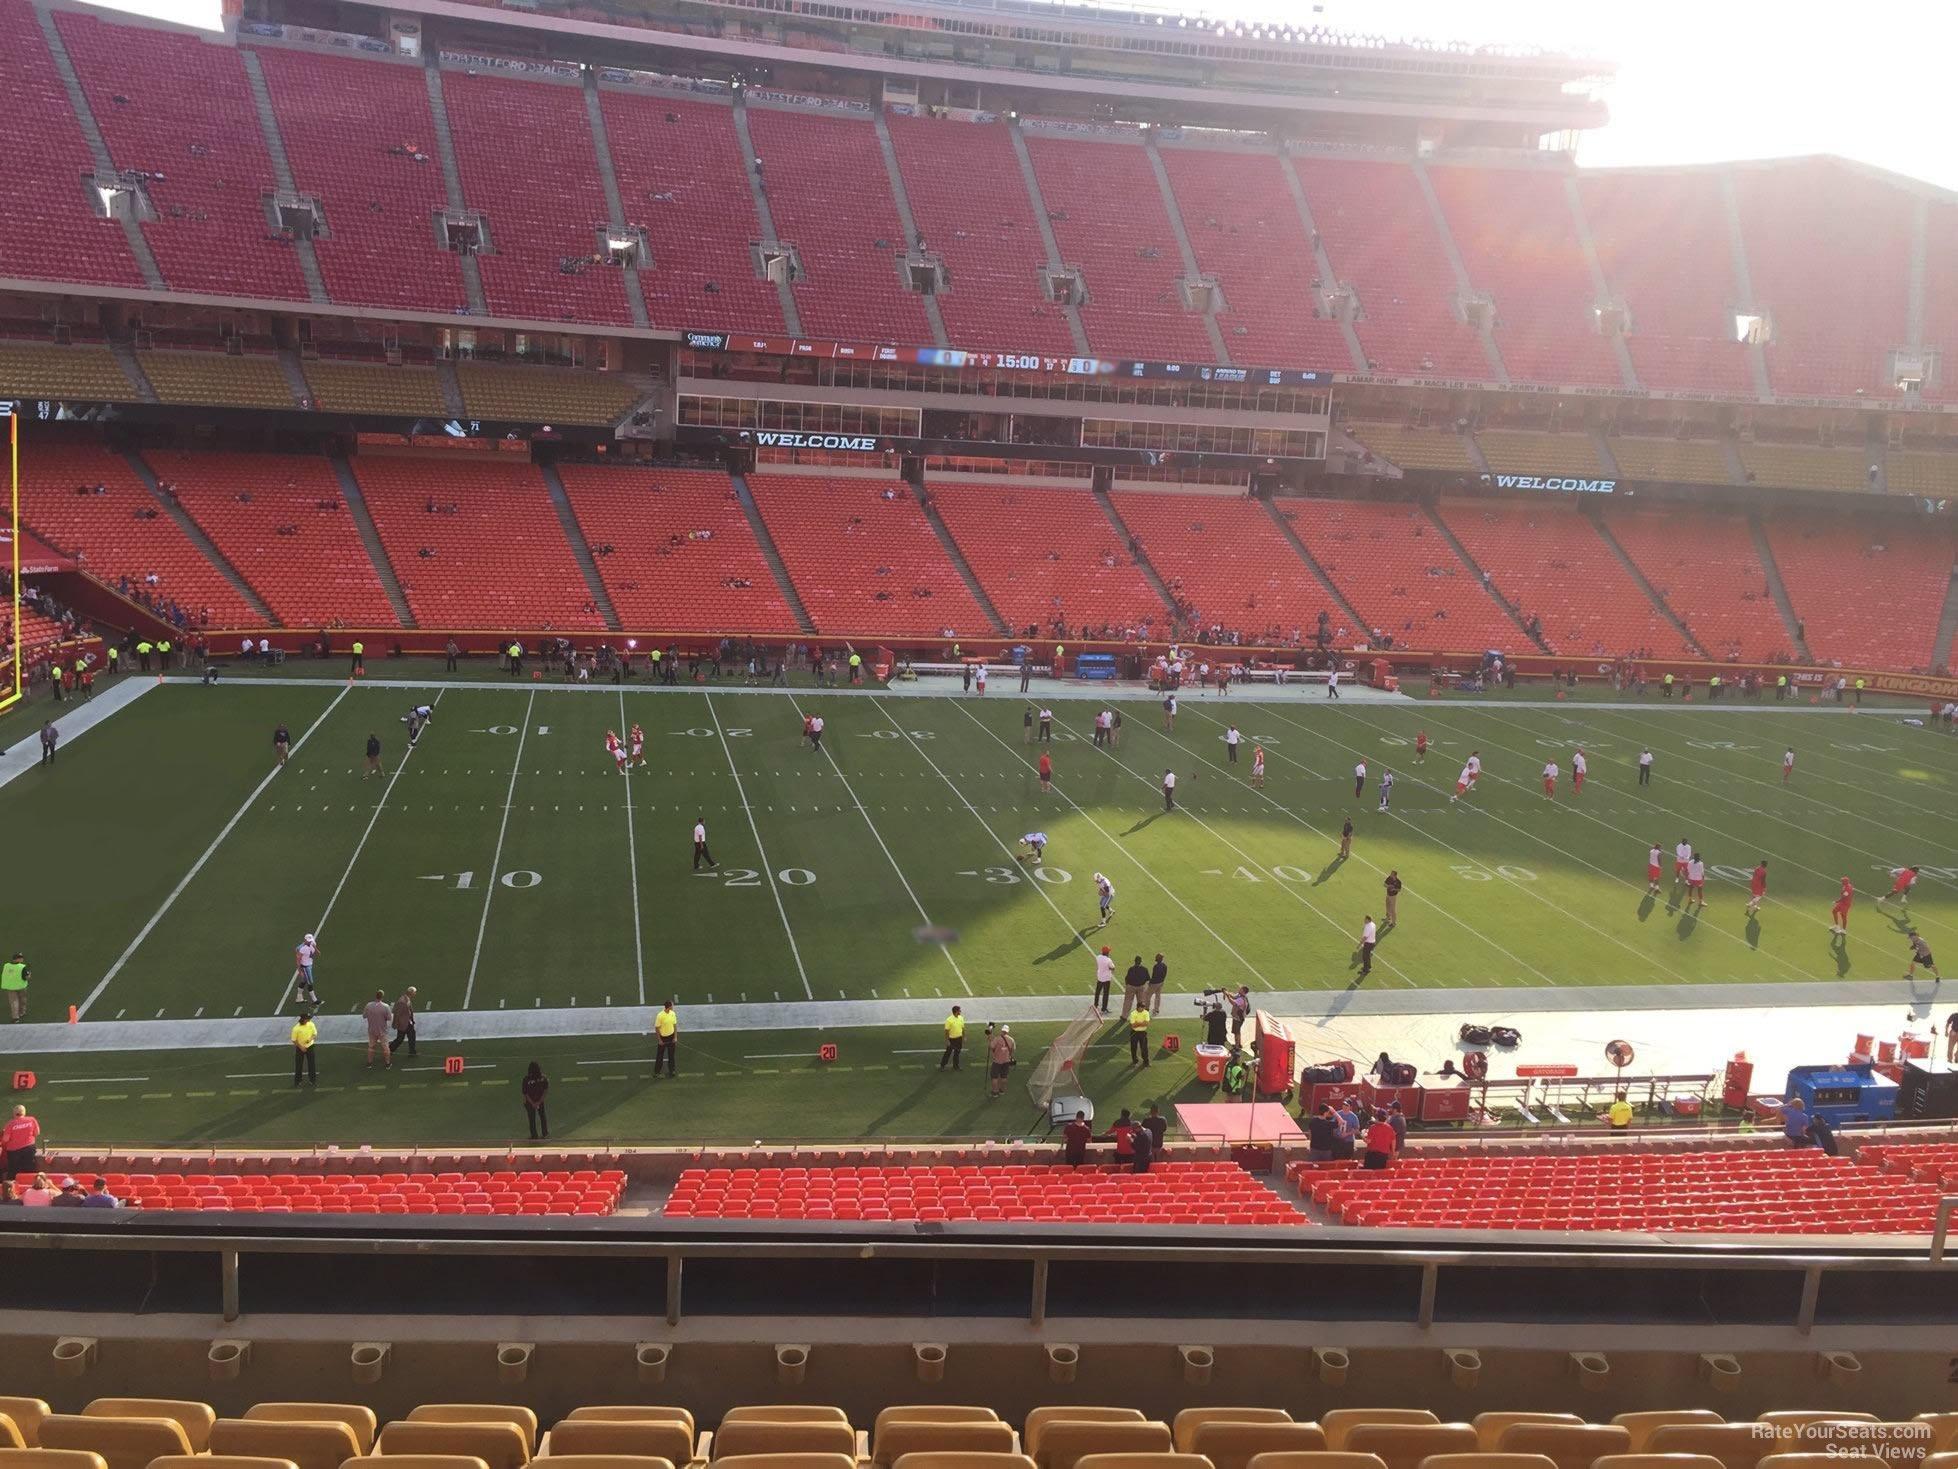 Arrowhead Stadium Section 204 - RateYourSeats.com